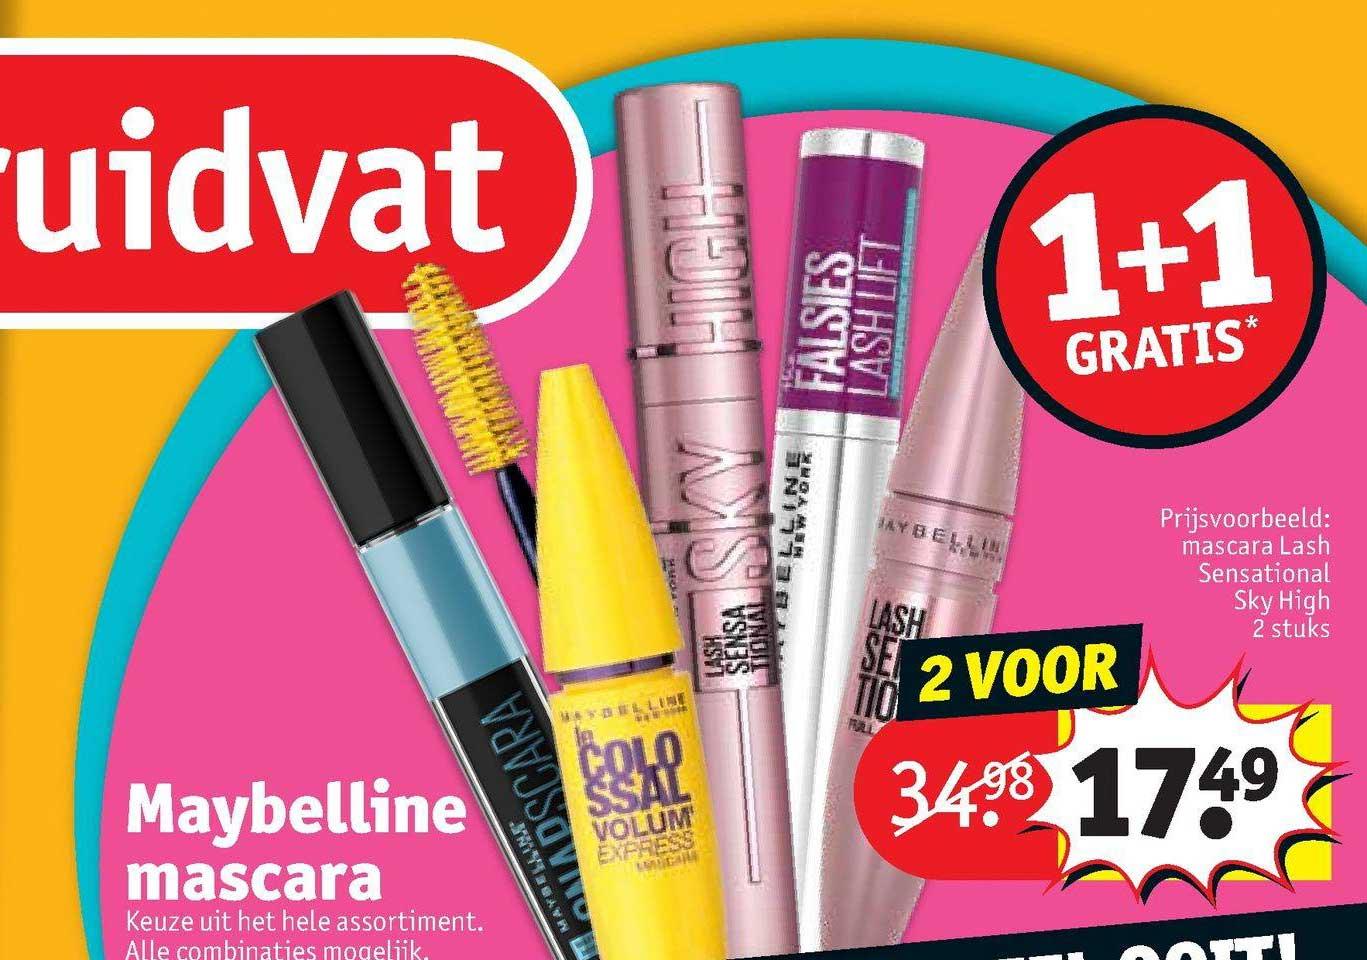 Kruidvat Maybelline Mascara 1+1 Gratis